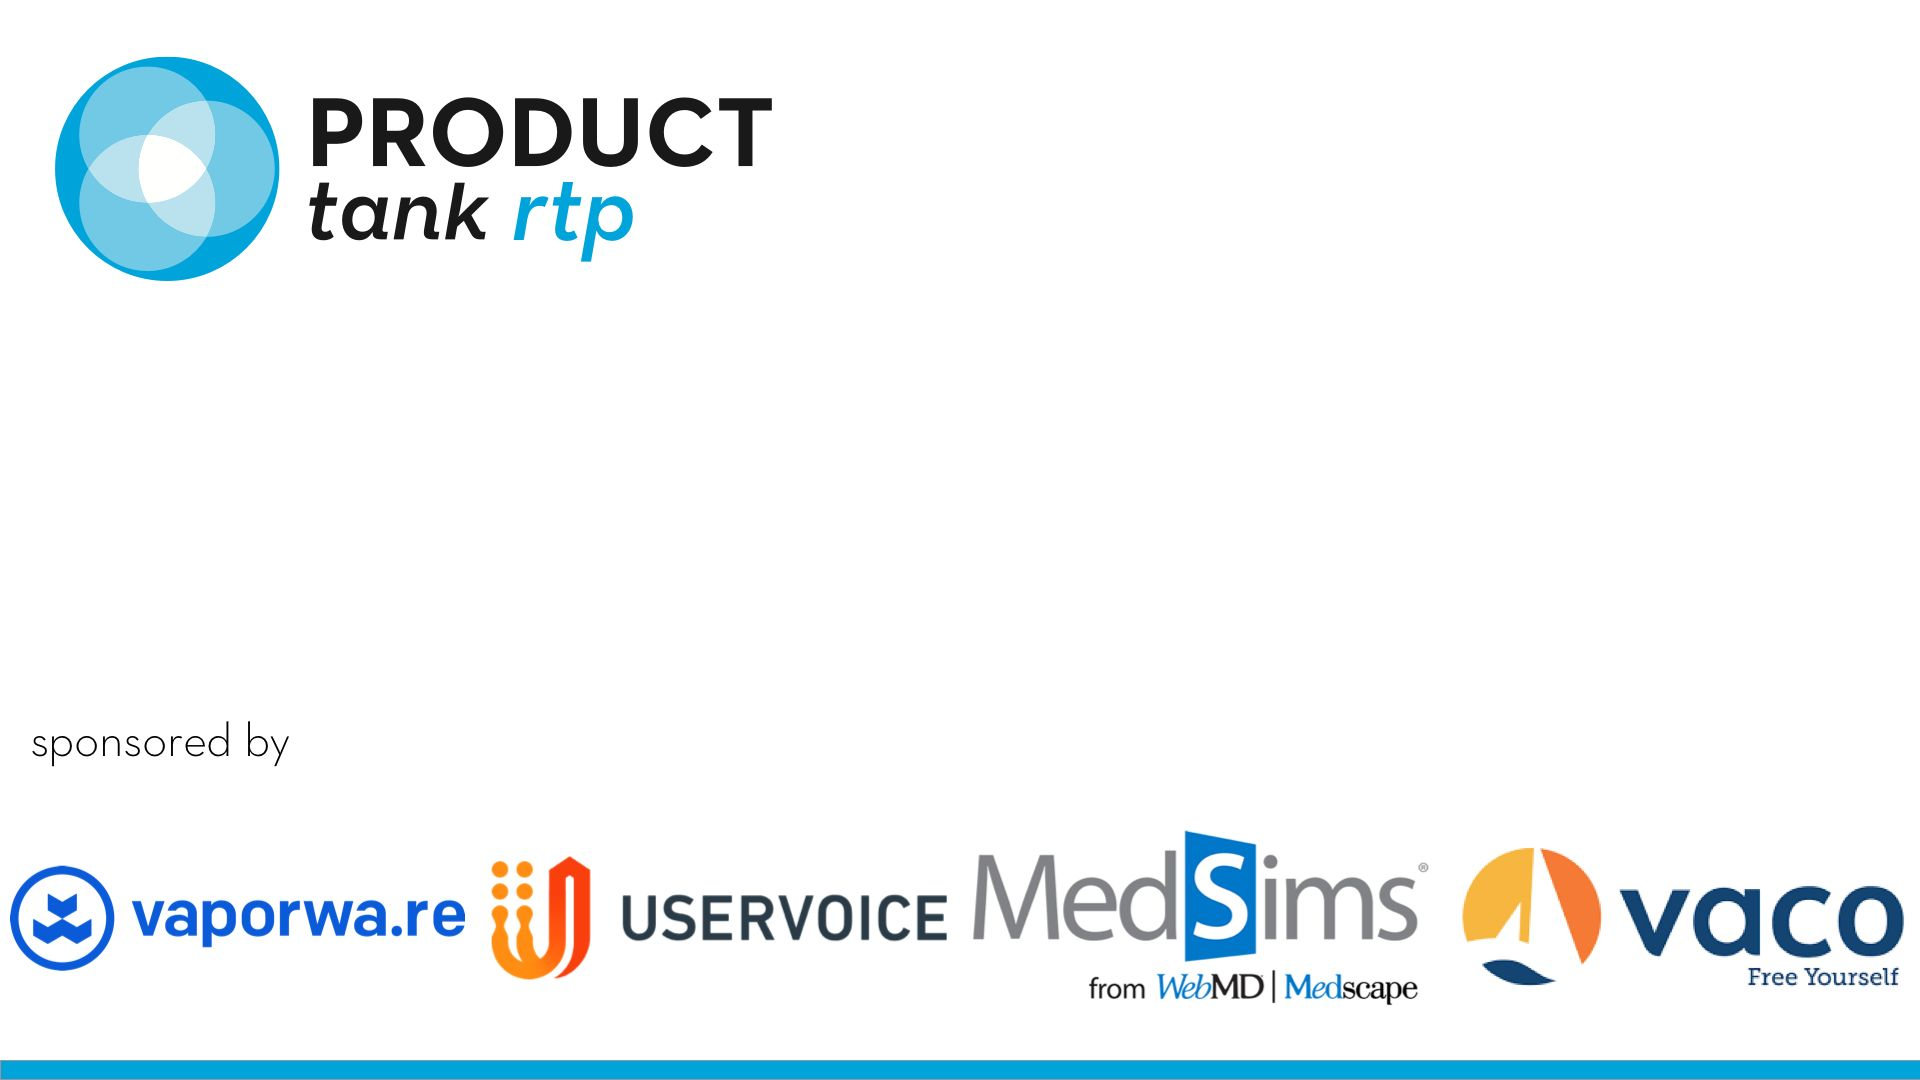 ProductTank RTP